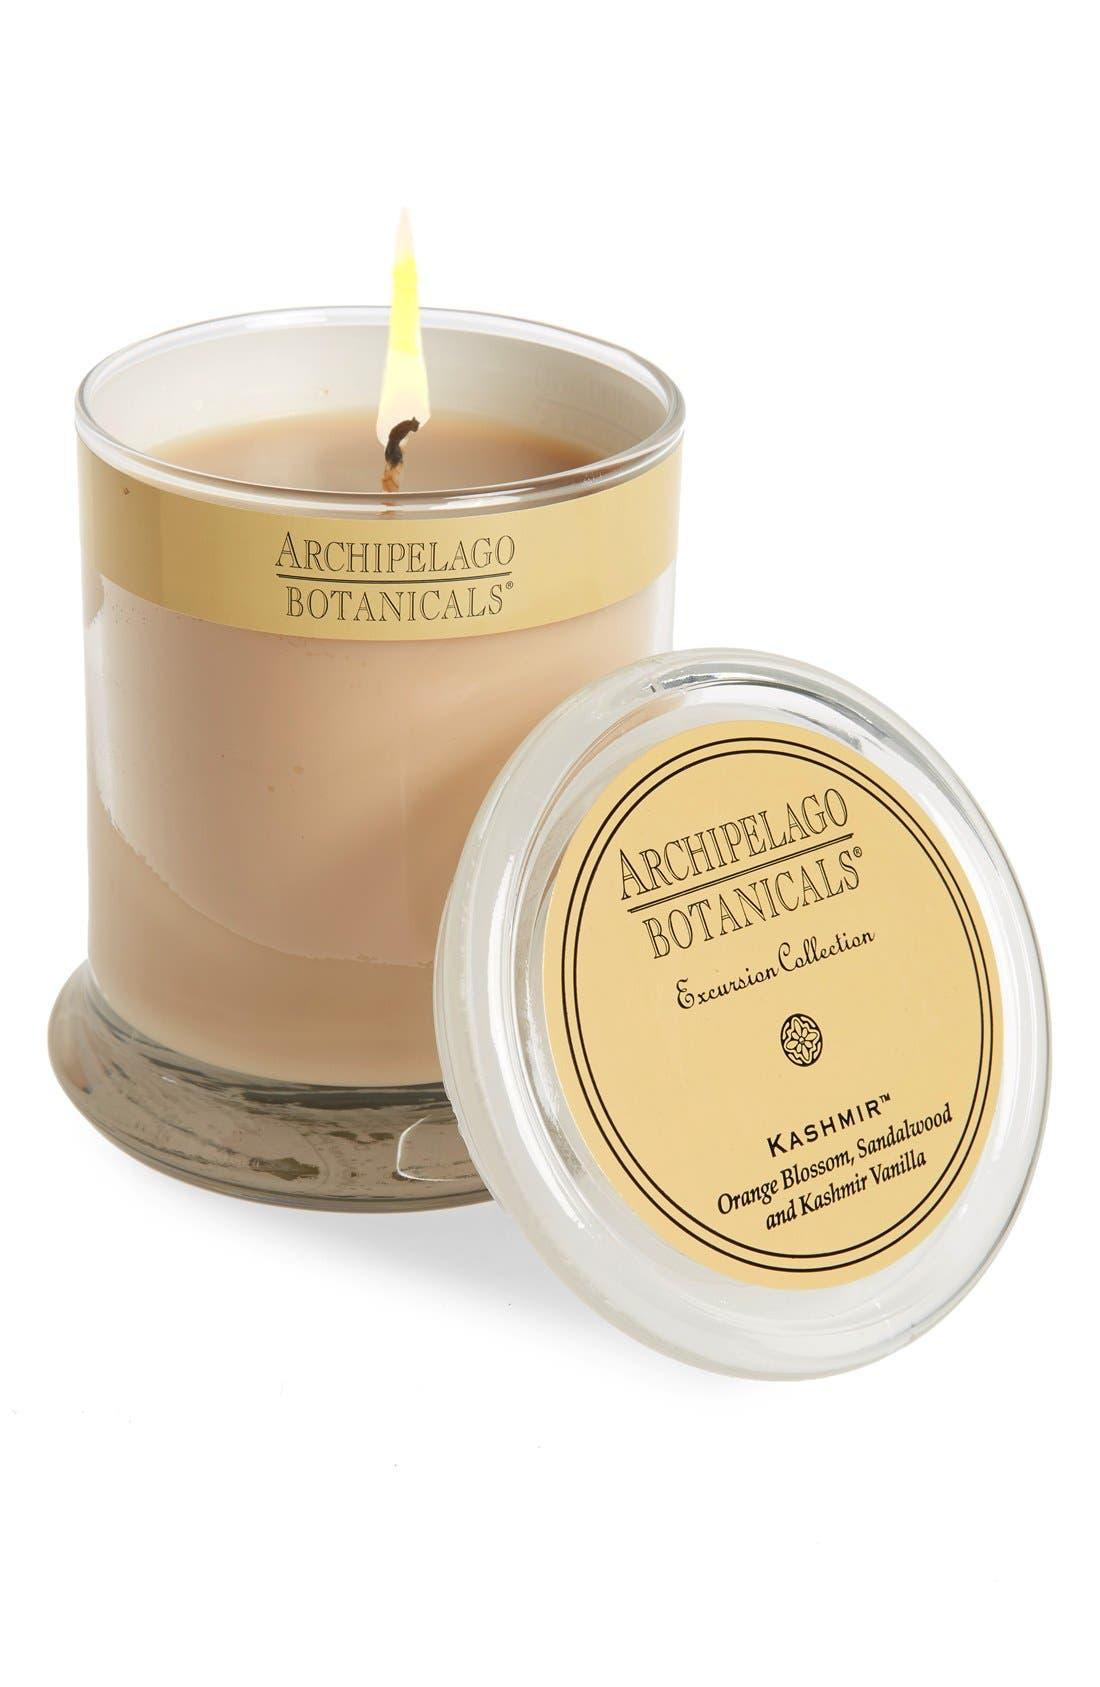 Archipelago Botanicals 'Excursion' Glass Jar Candle